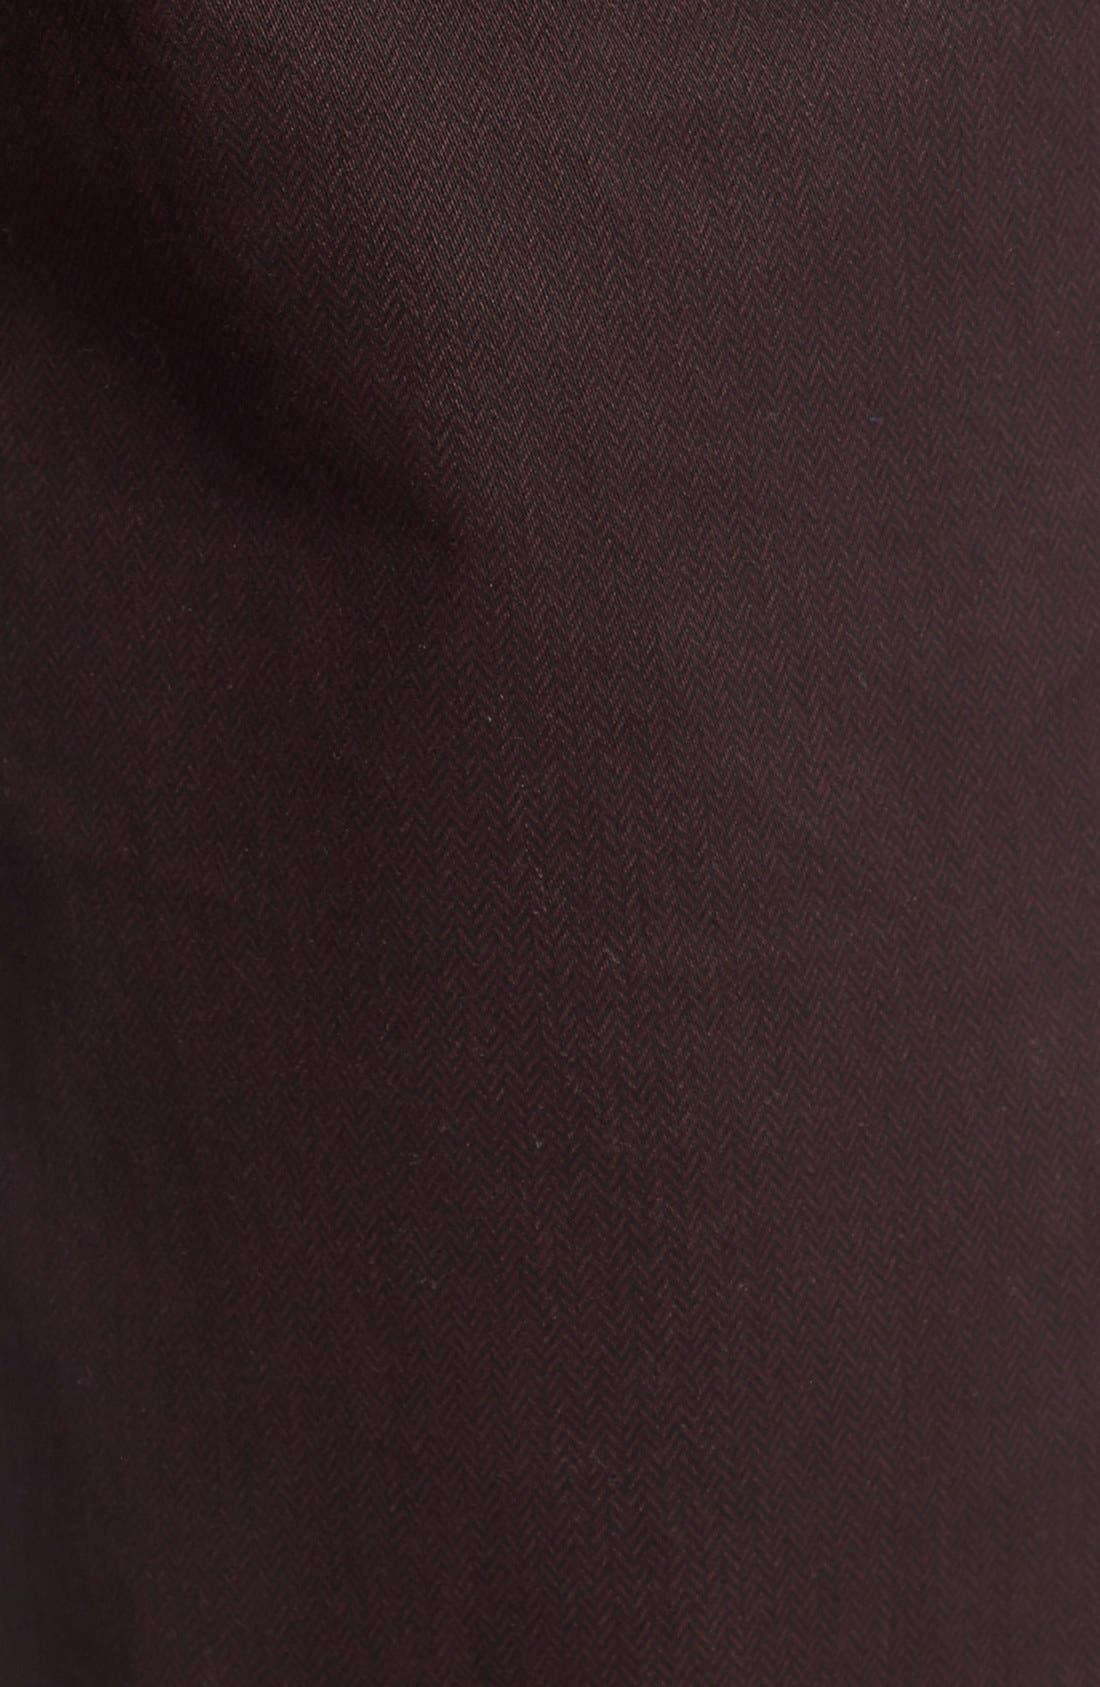 Print Slim Fit Trouser Jeans,                             Alternate thumbnail 5, color,                             Dark Red